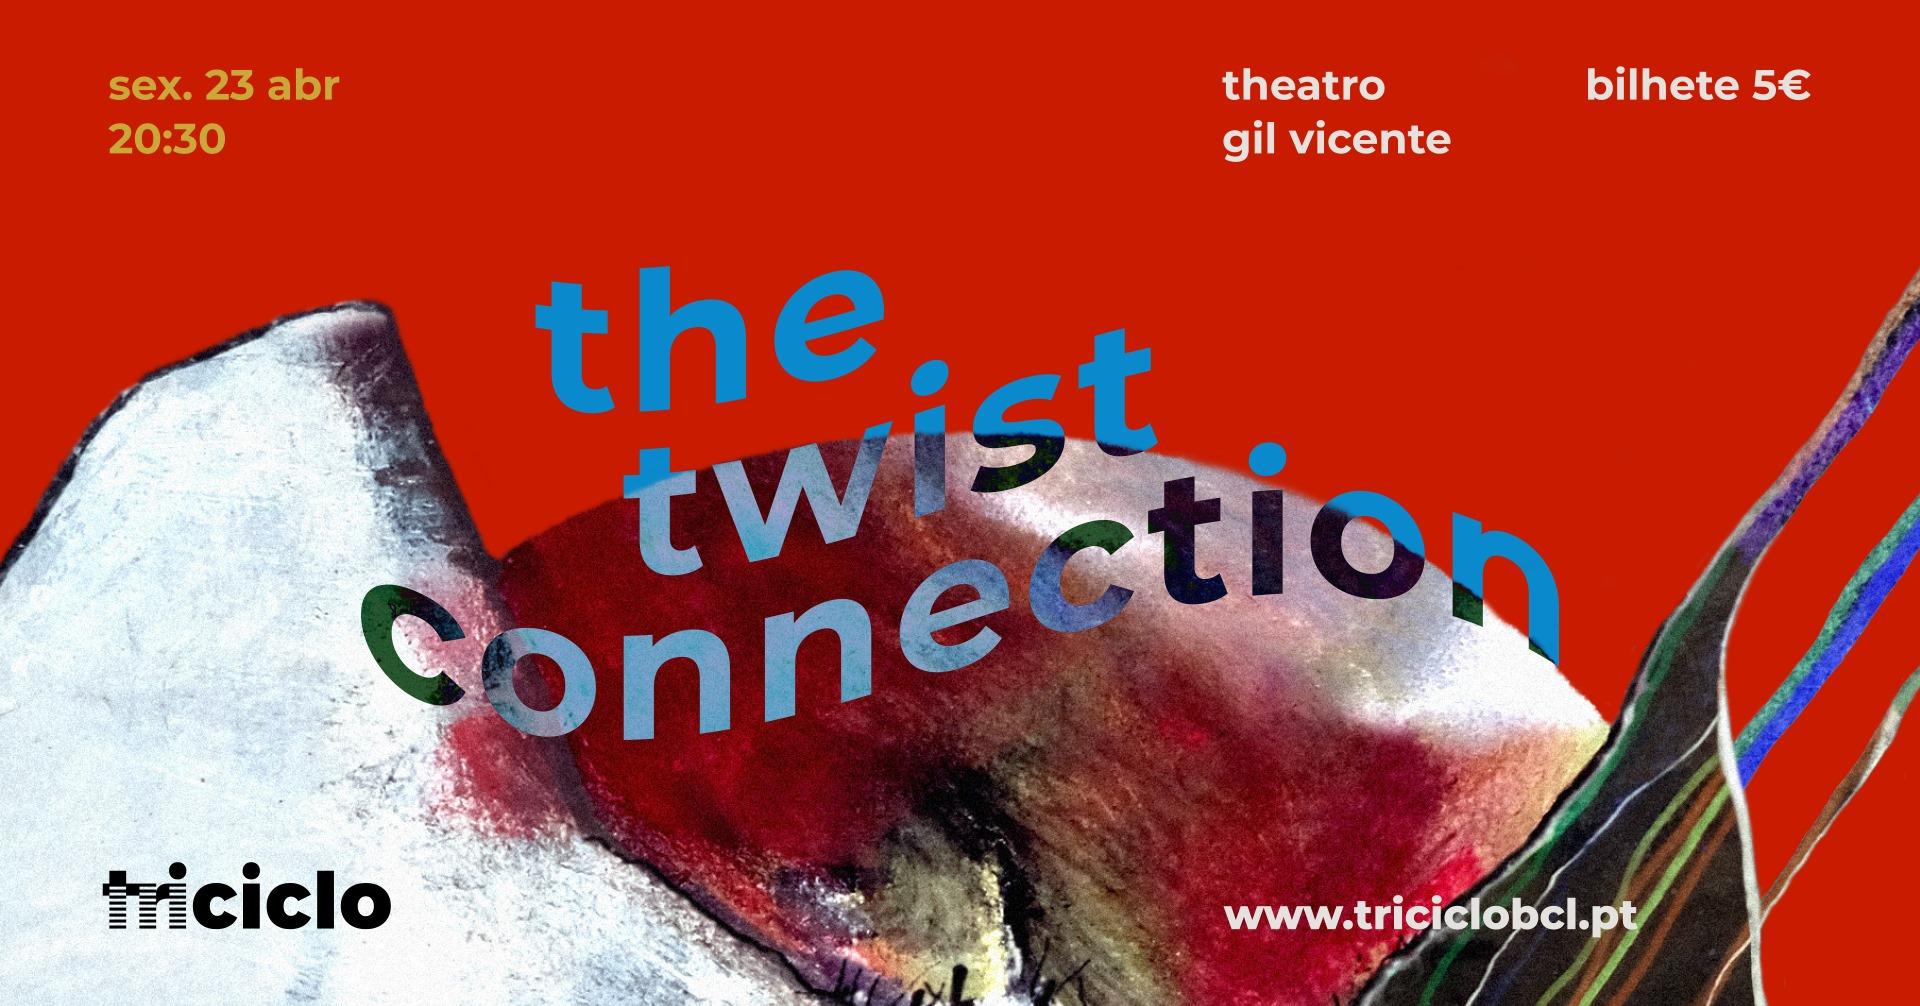 triciclo / the twist connection no tgv